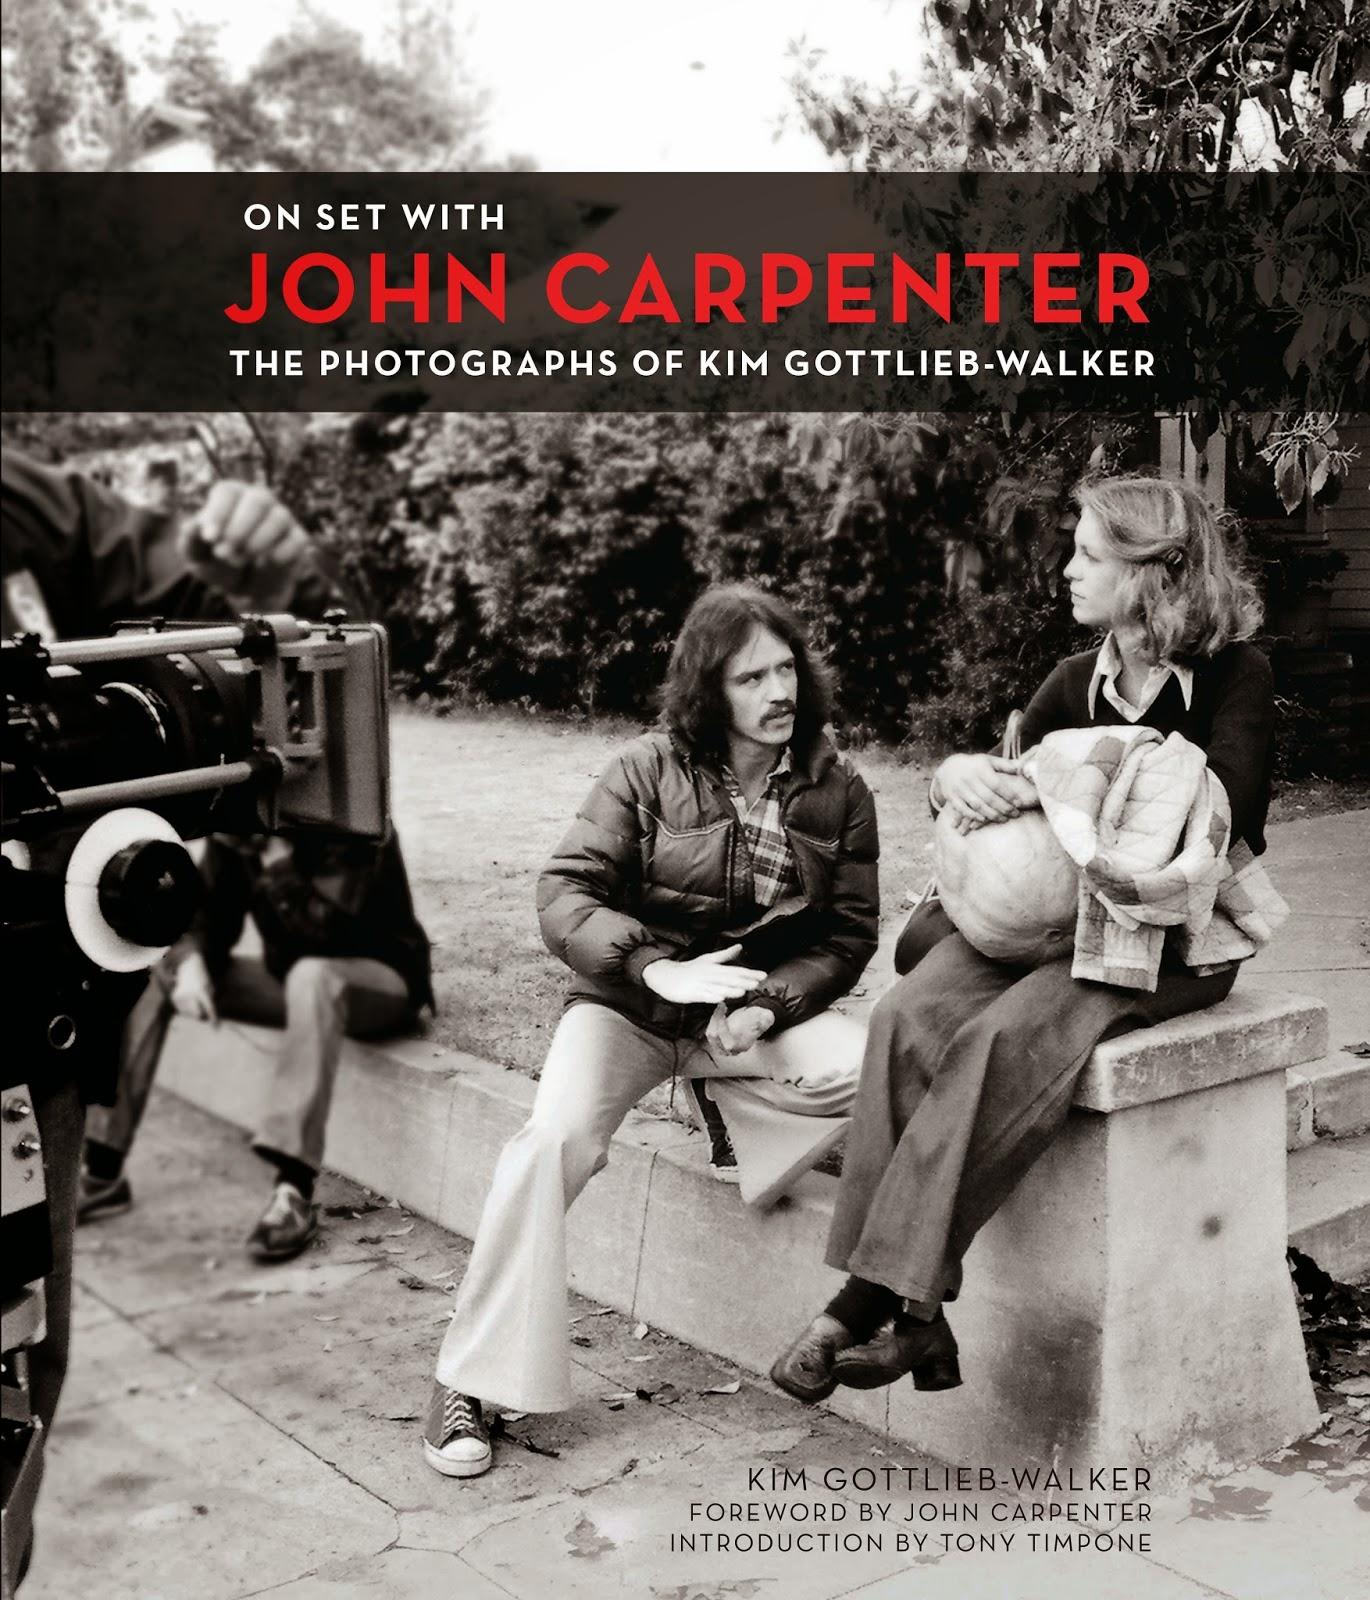 John Carpenter photographs